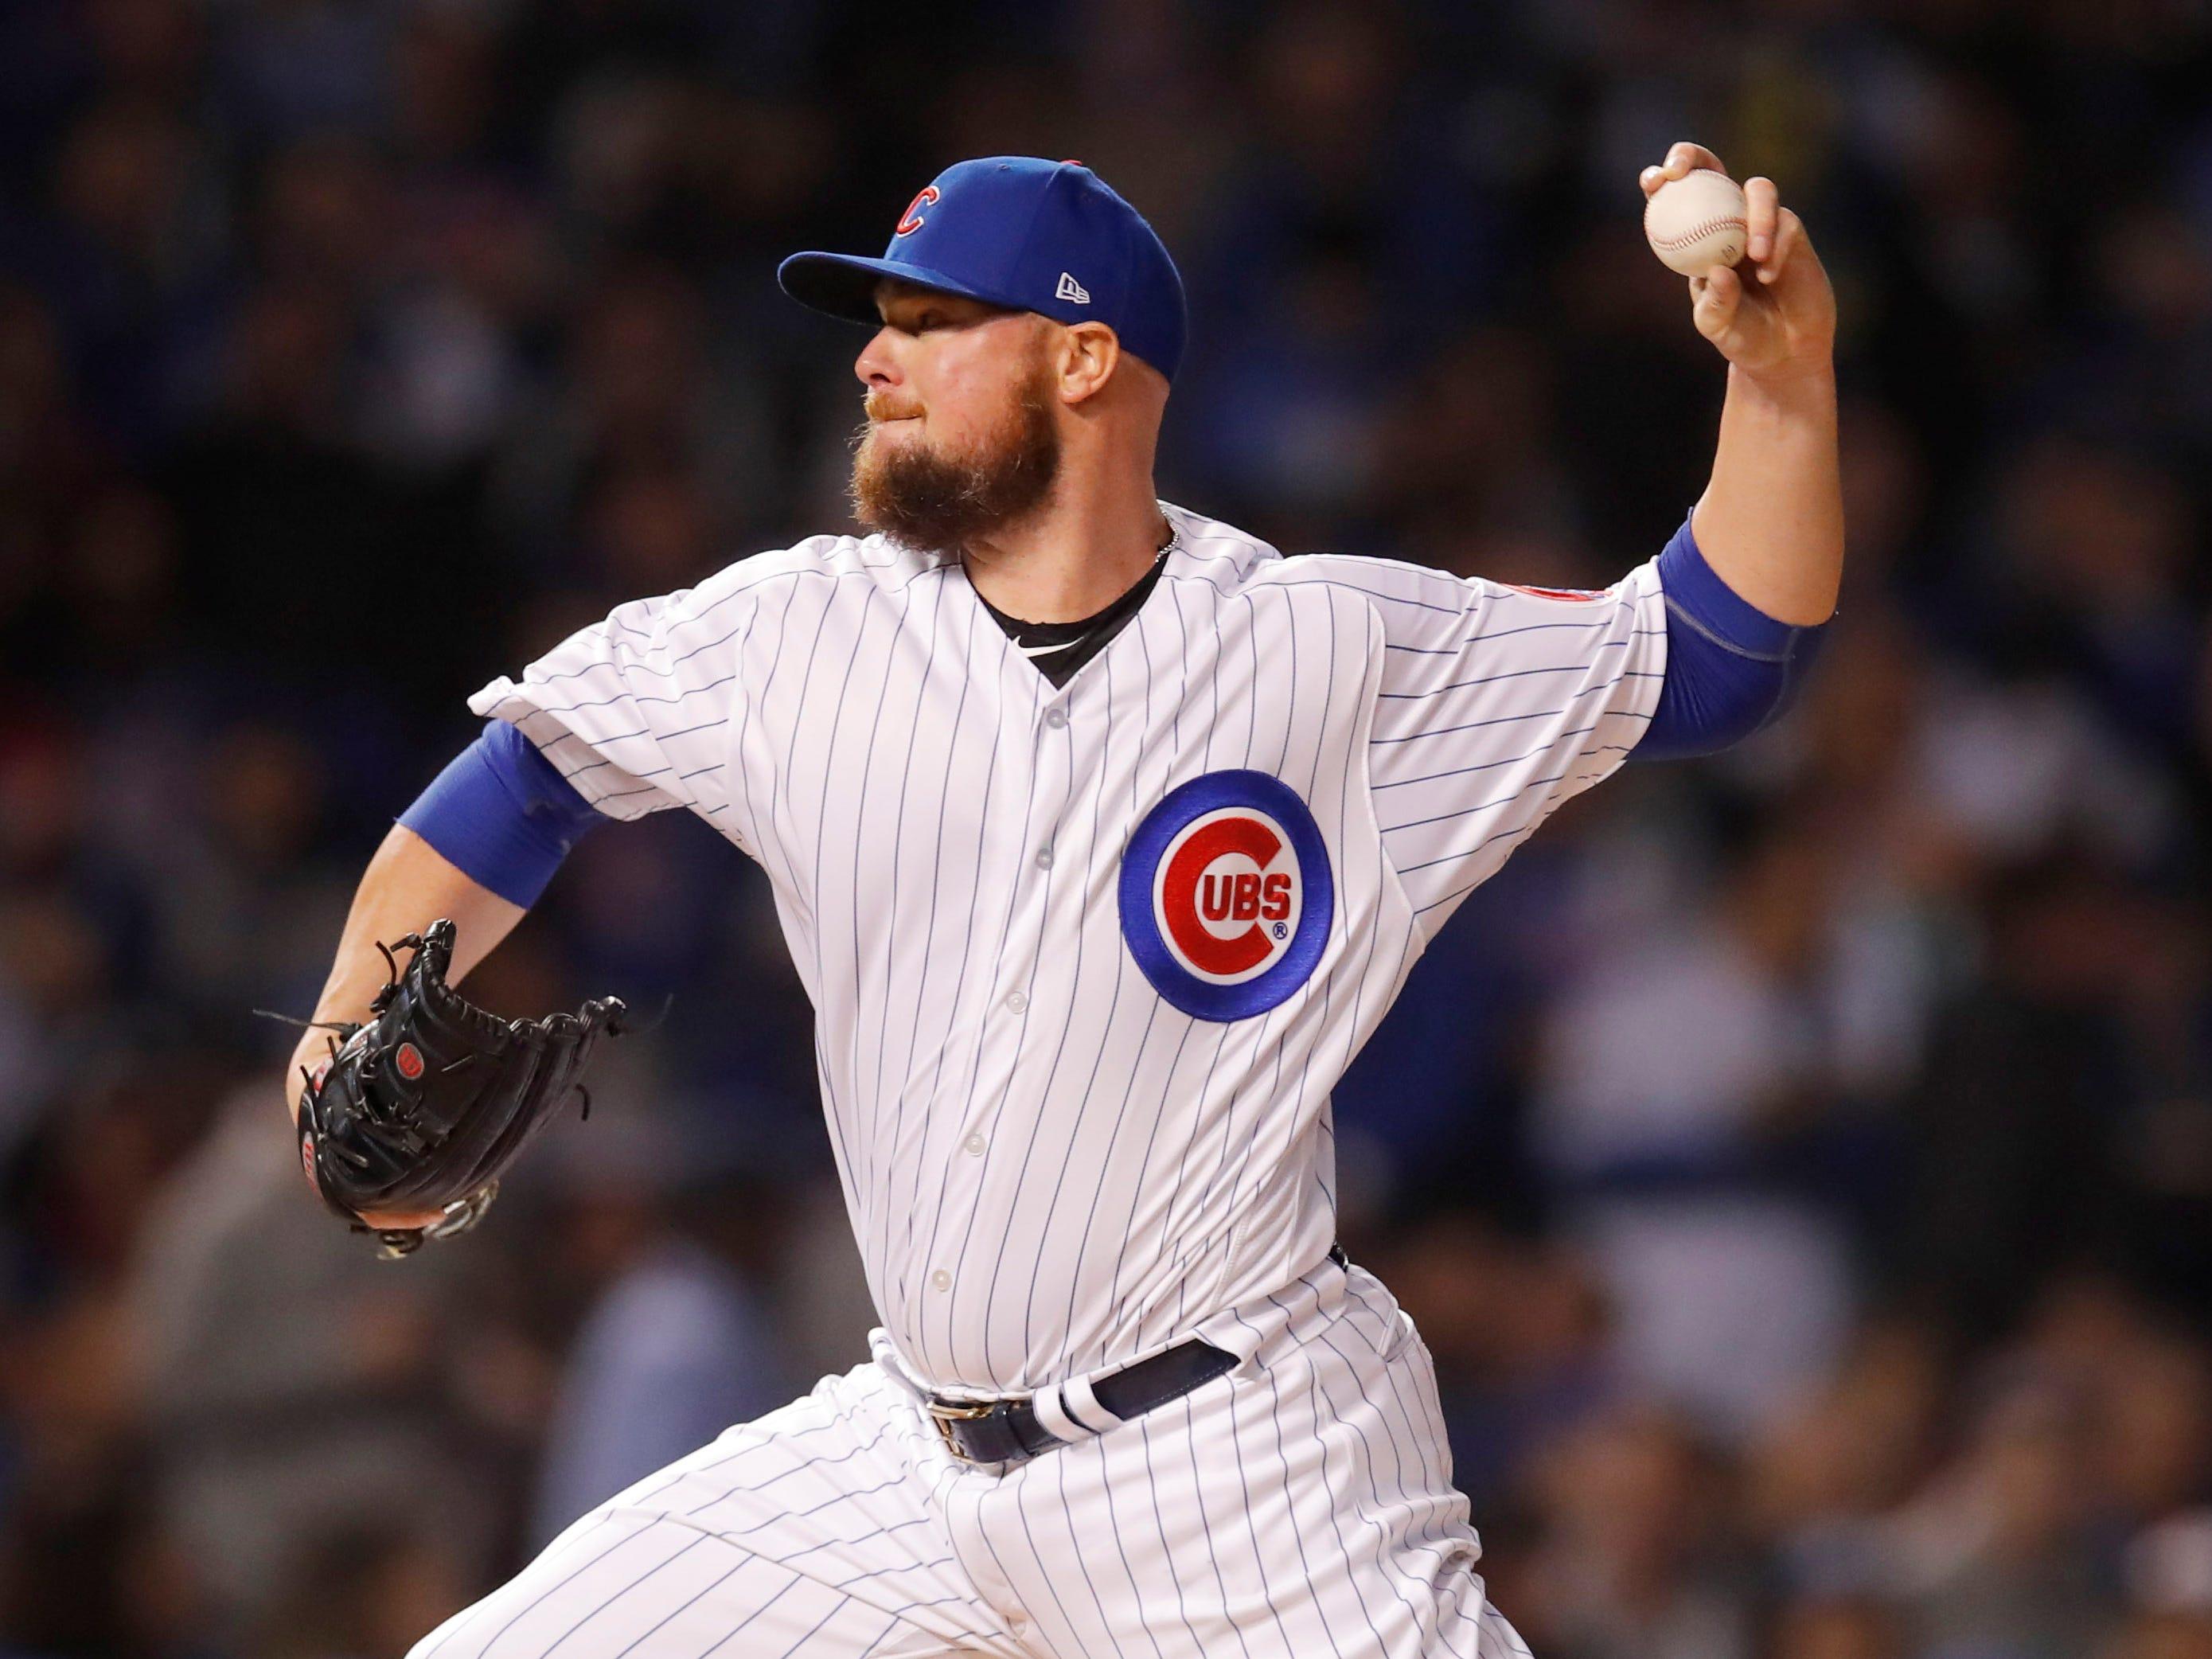 LHP Jon Lester, Cubs: $27,500,000